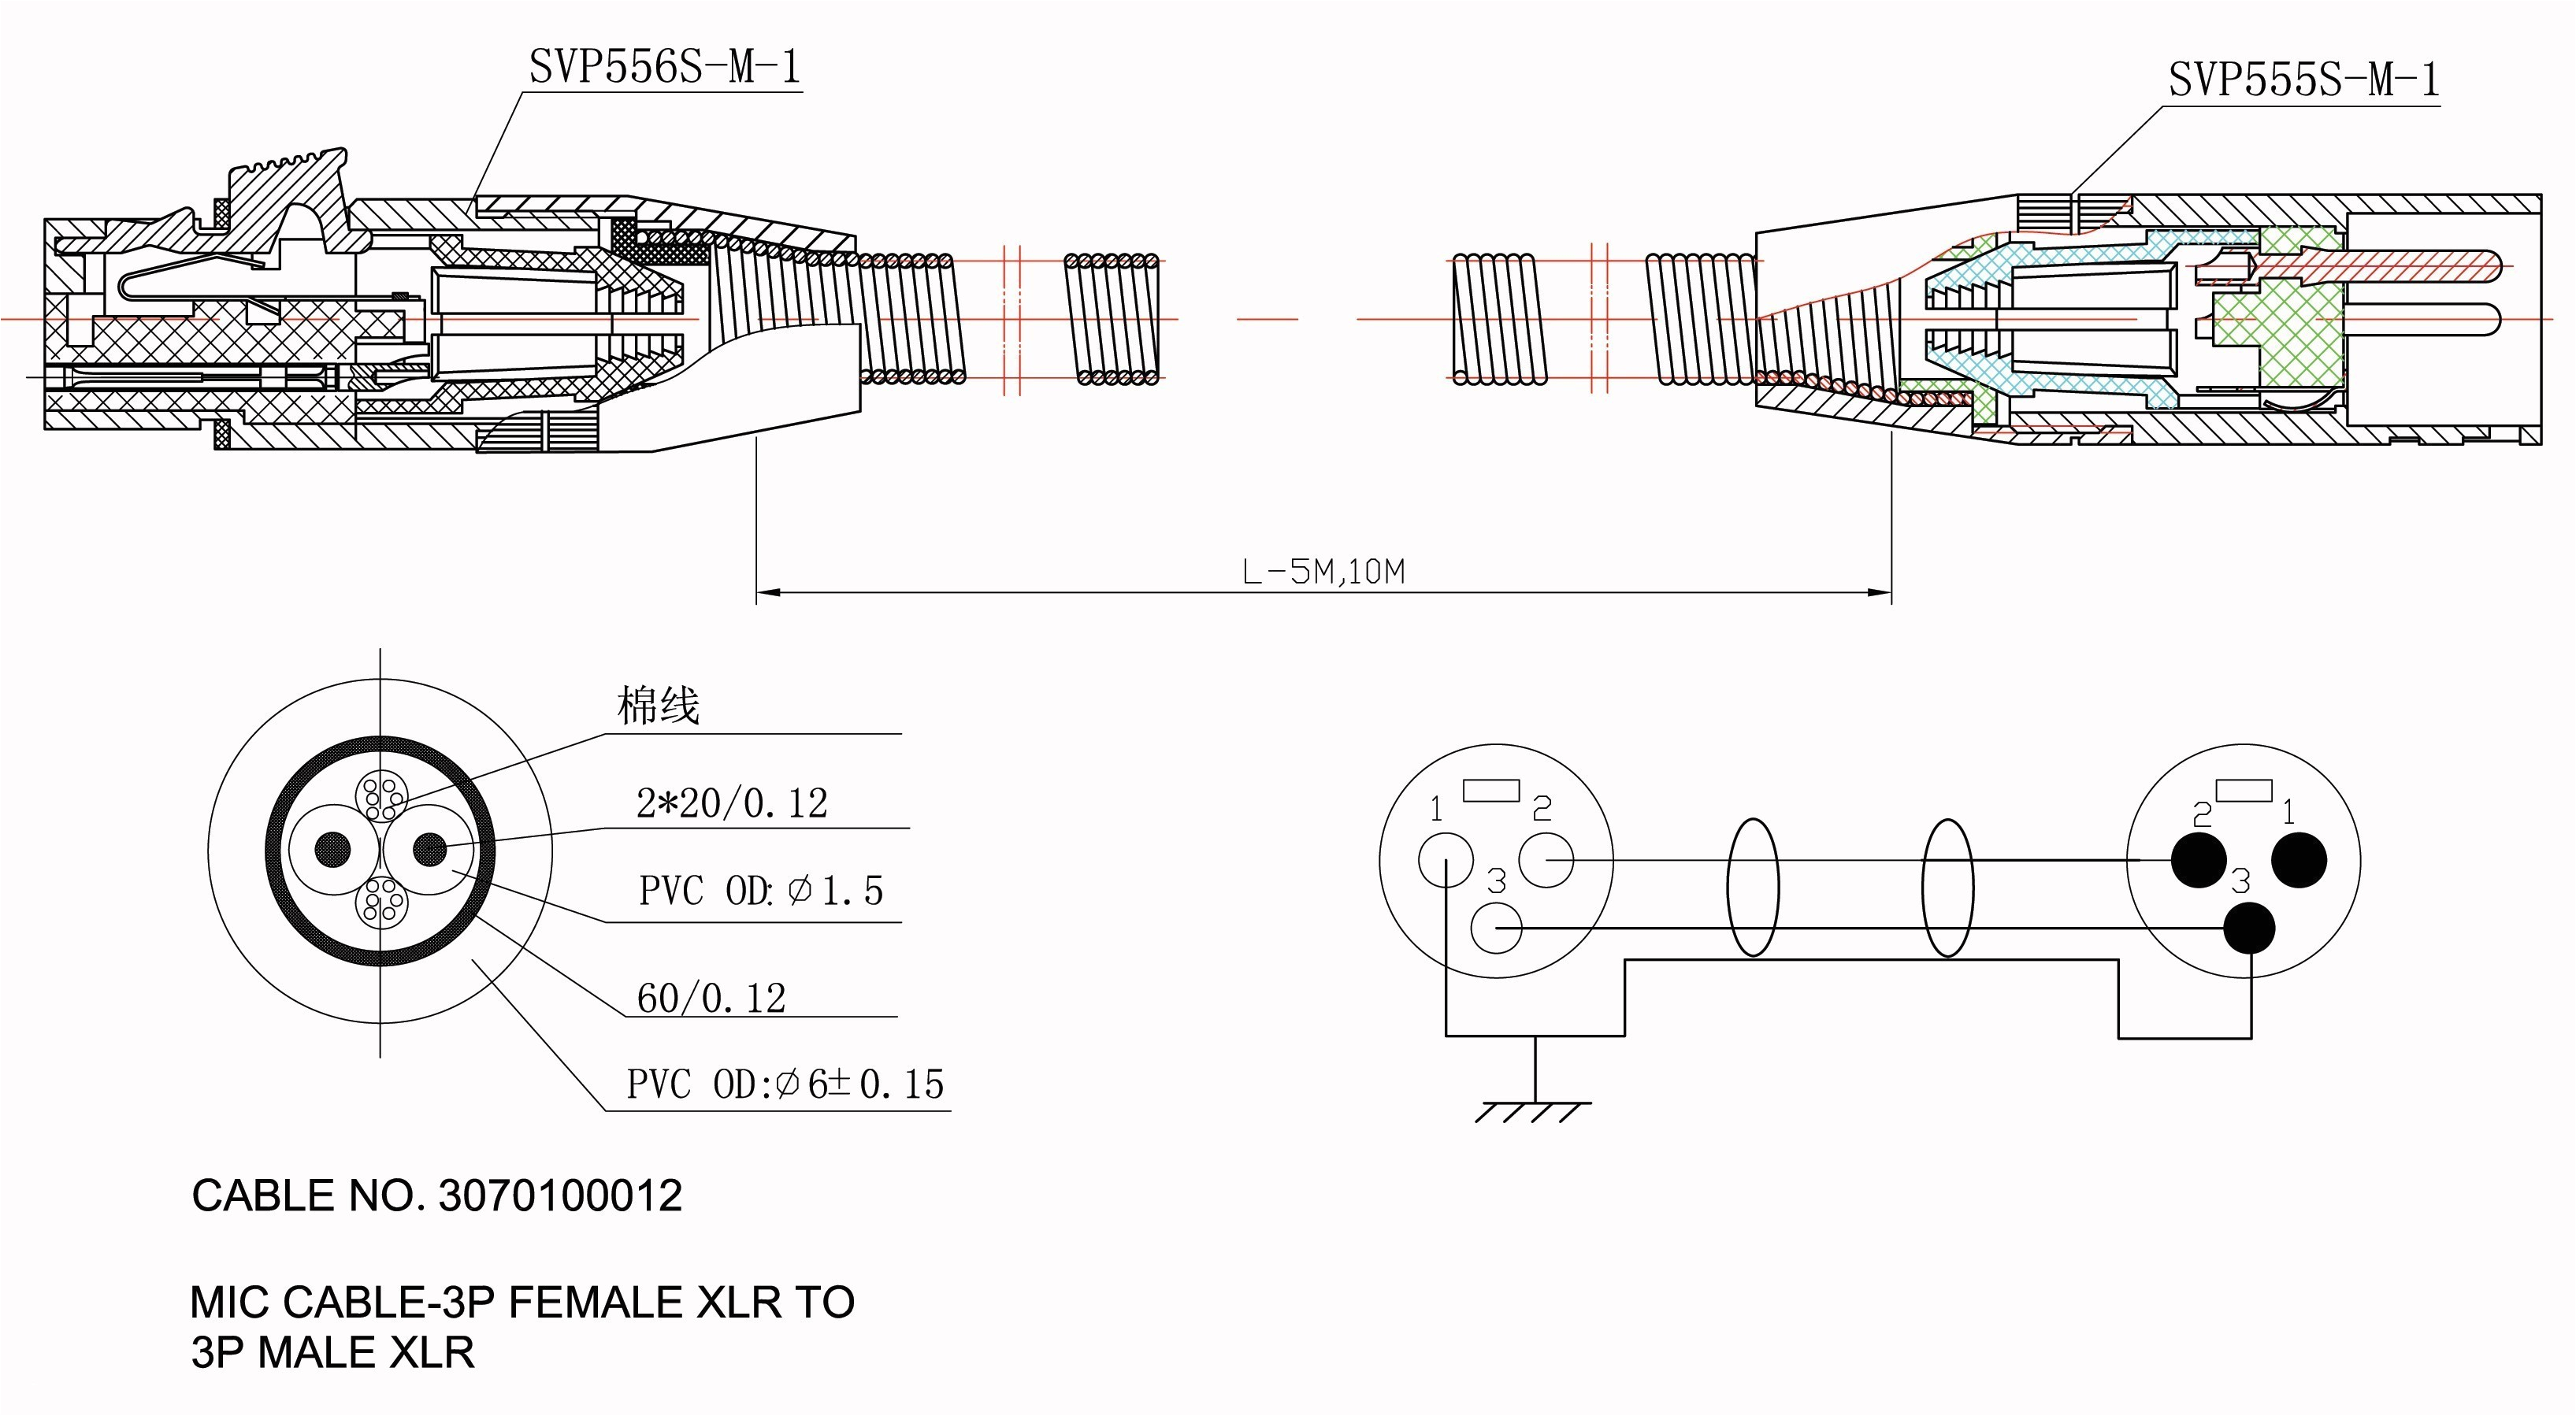 lsp wiring diagrams wiring diagram mega lsp wiring diagrams